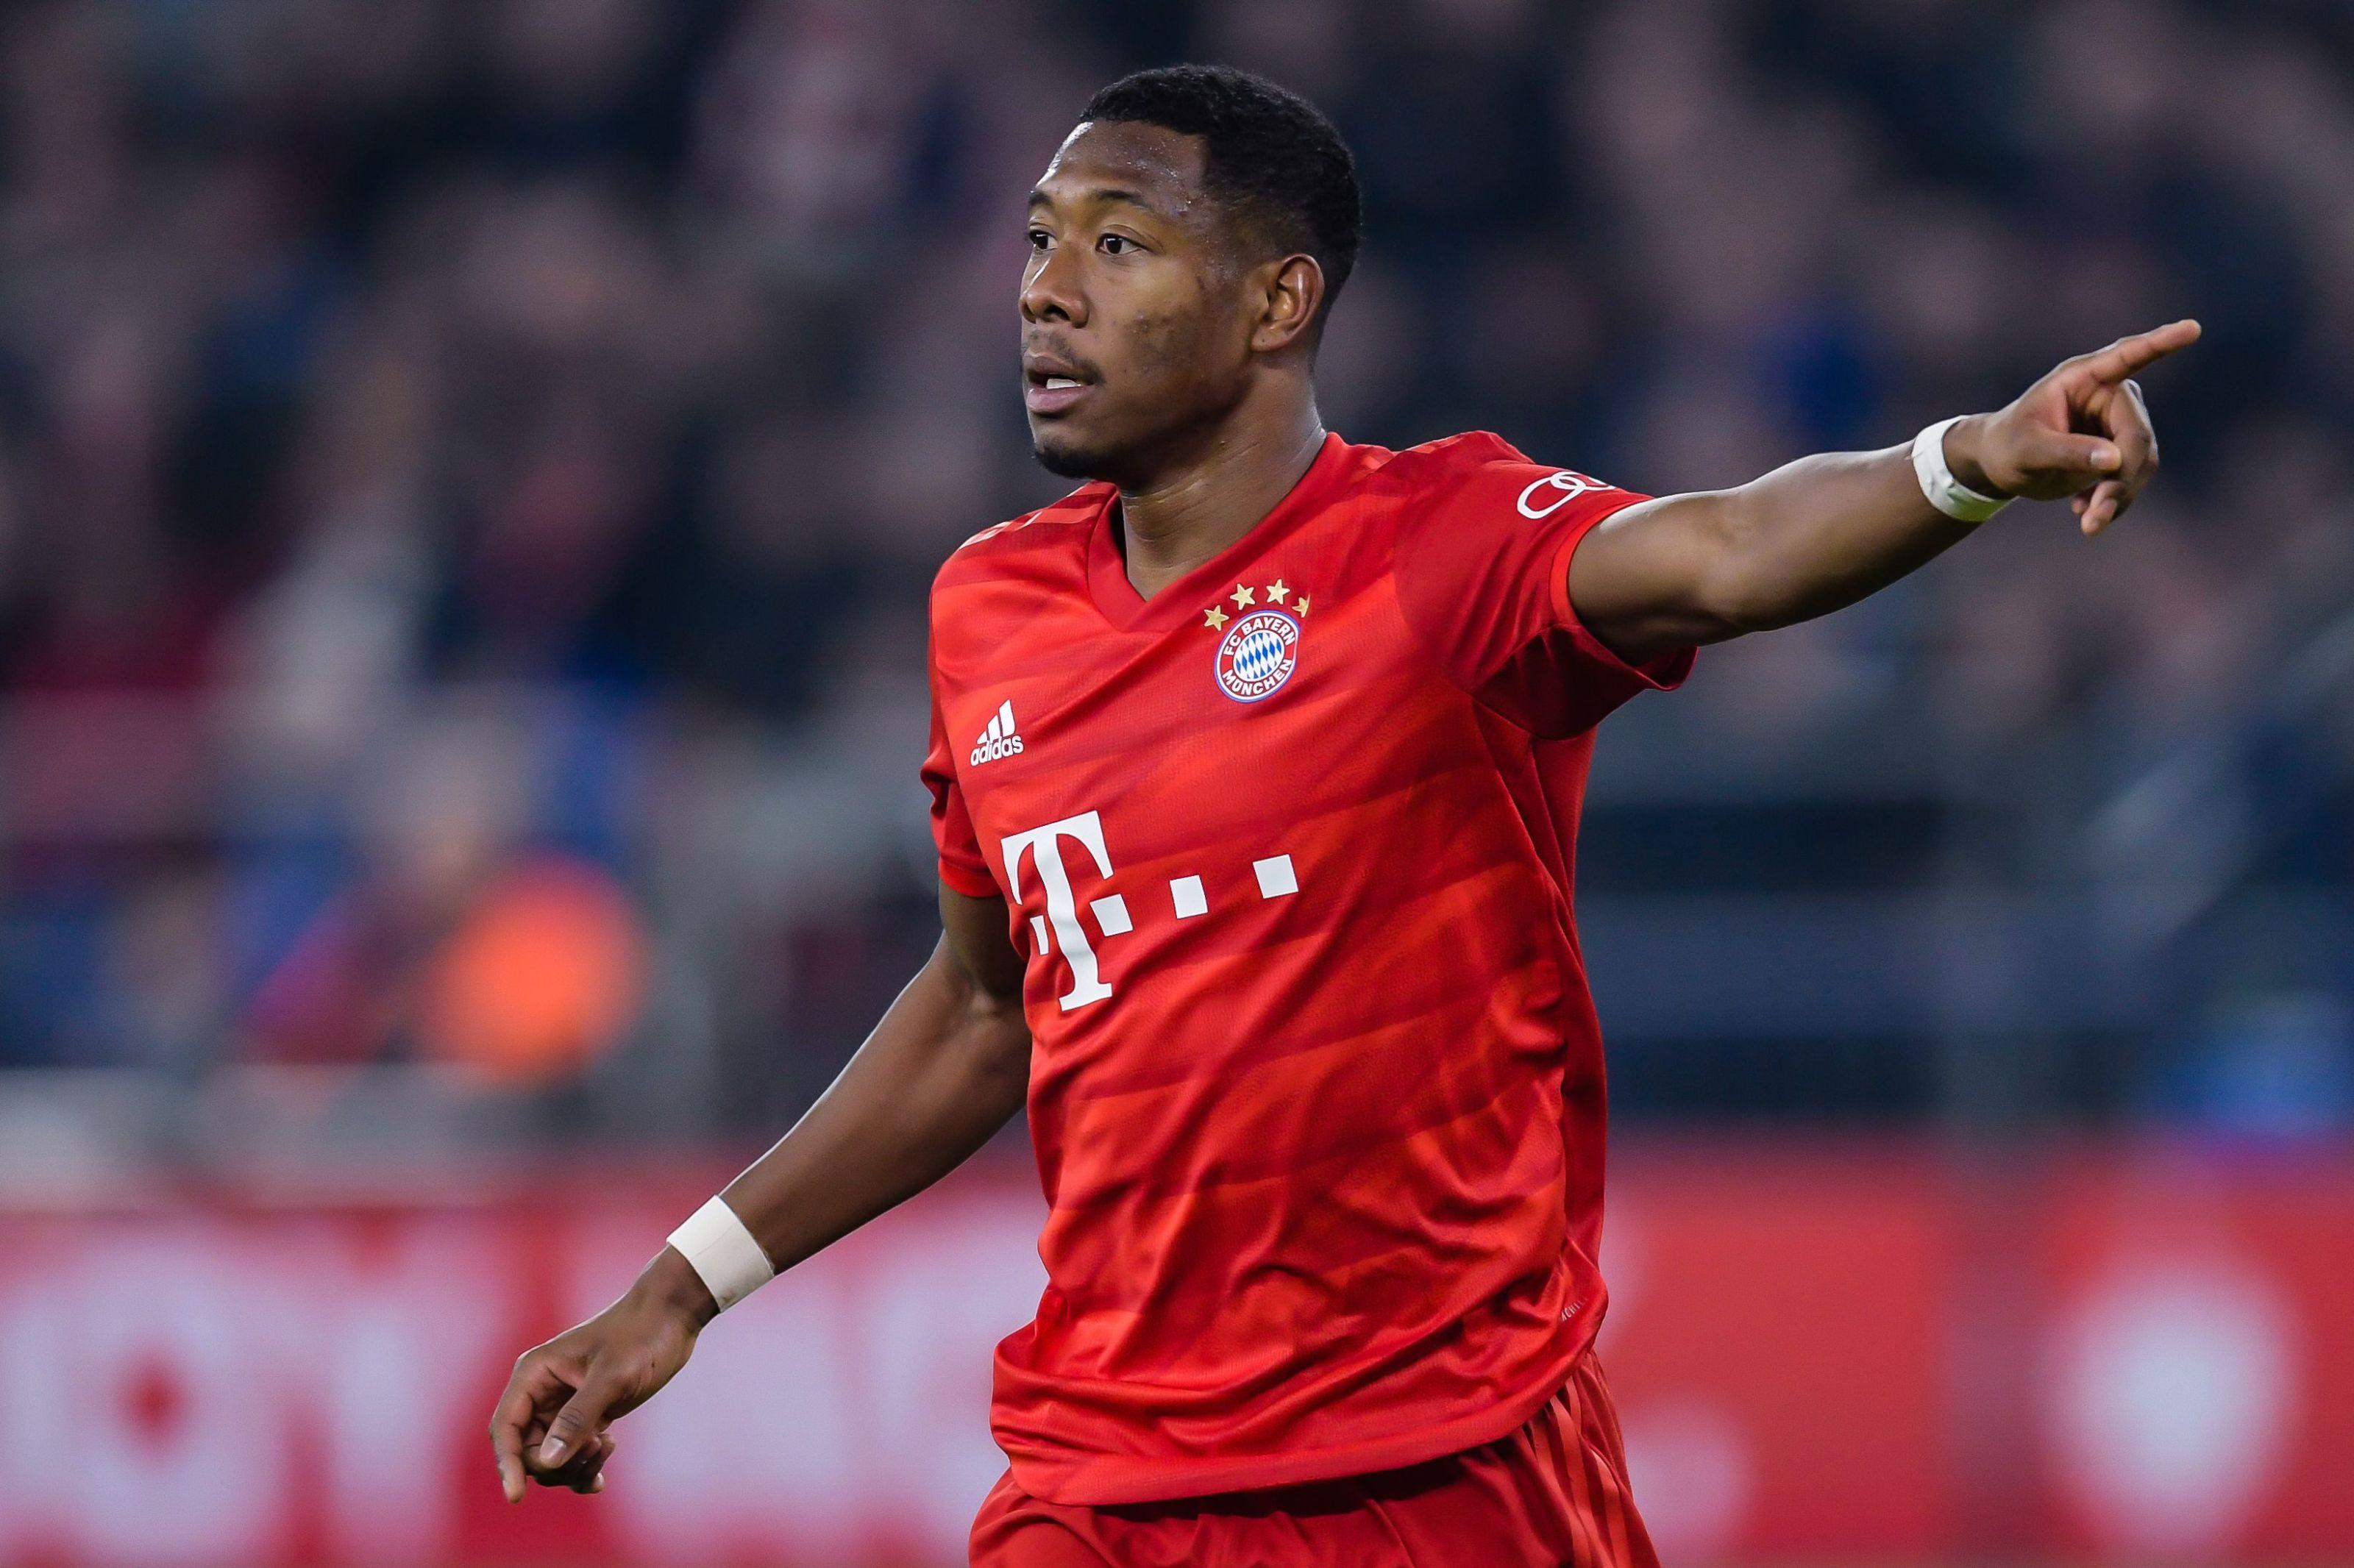 David Alaba should continue in central defense for Bayern Munich